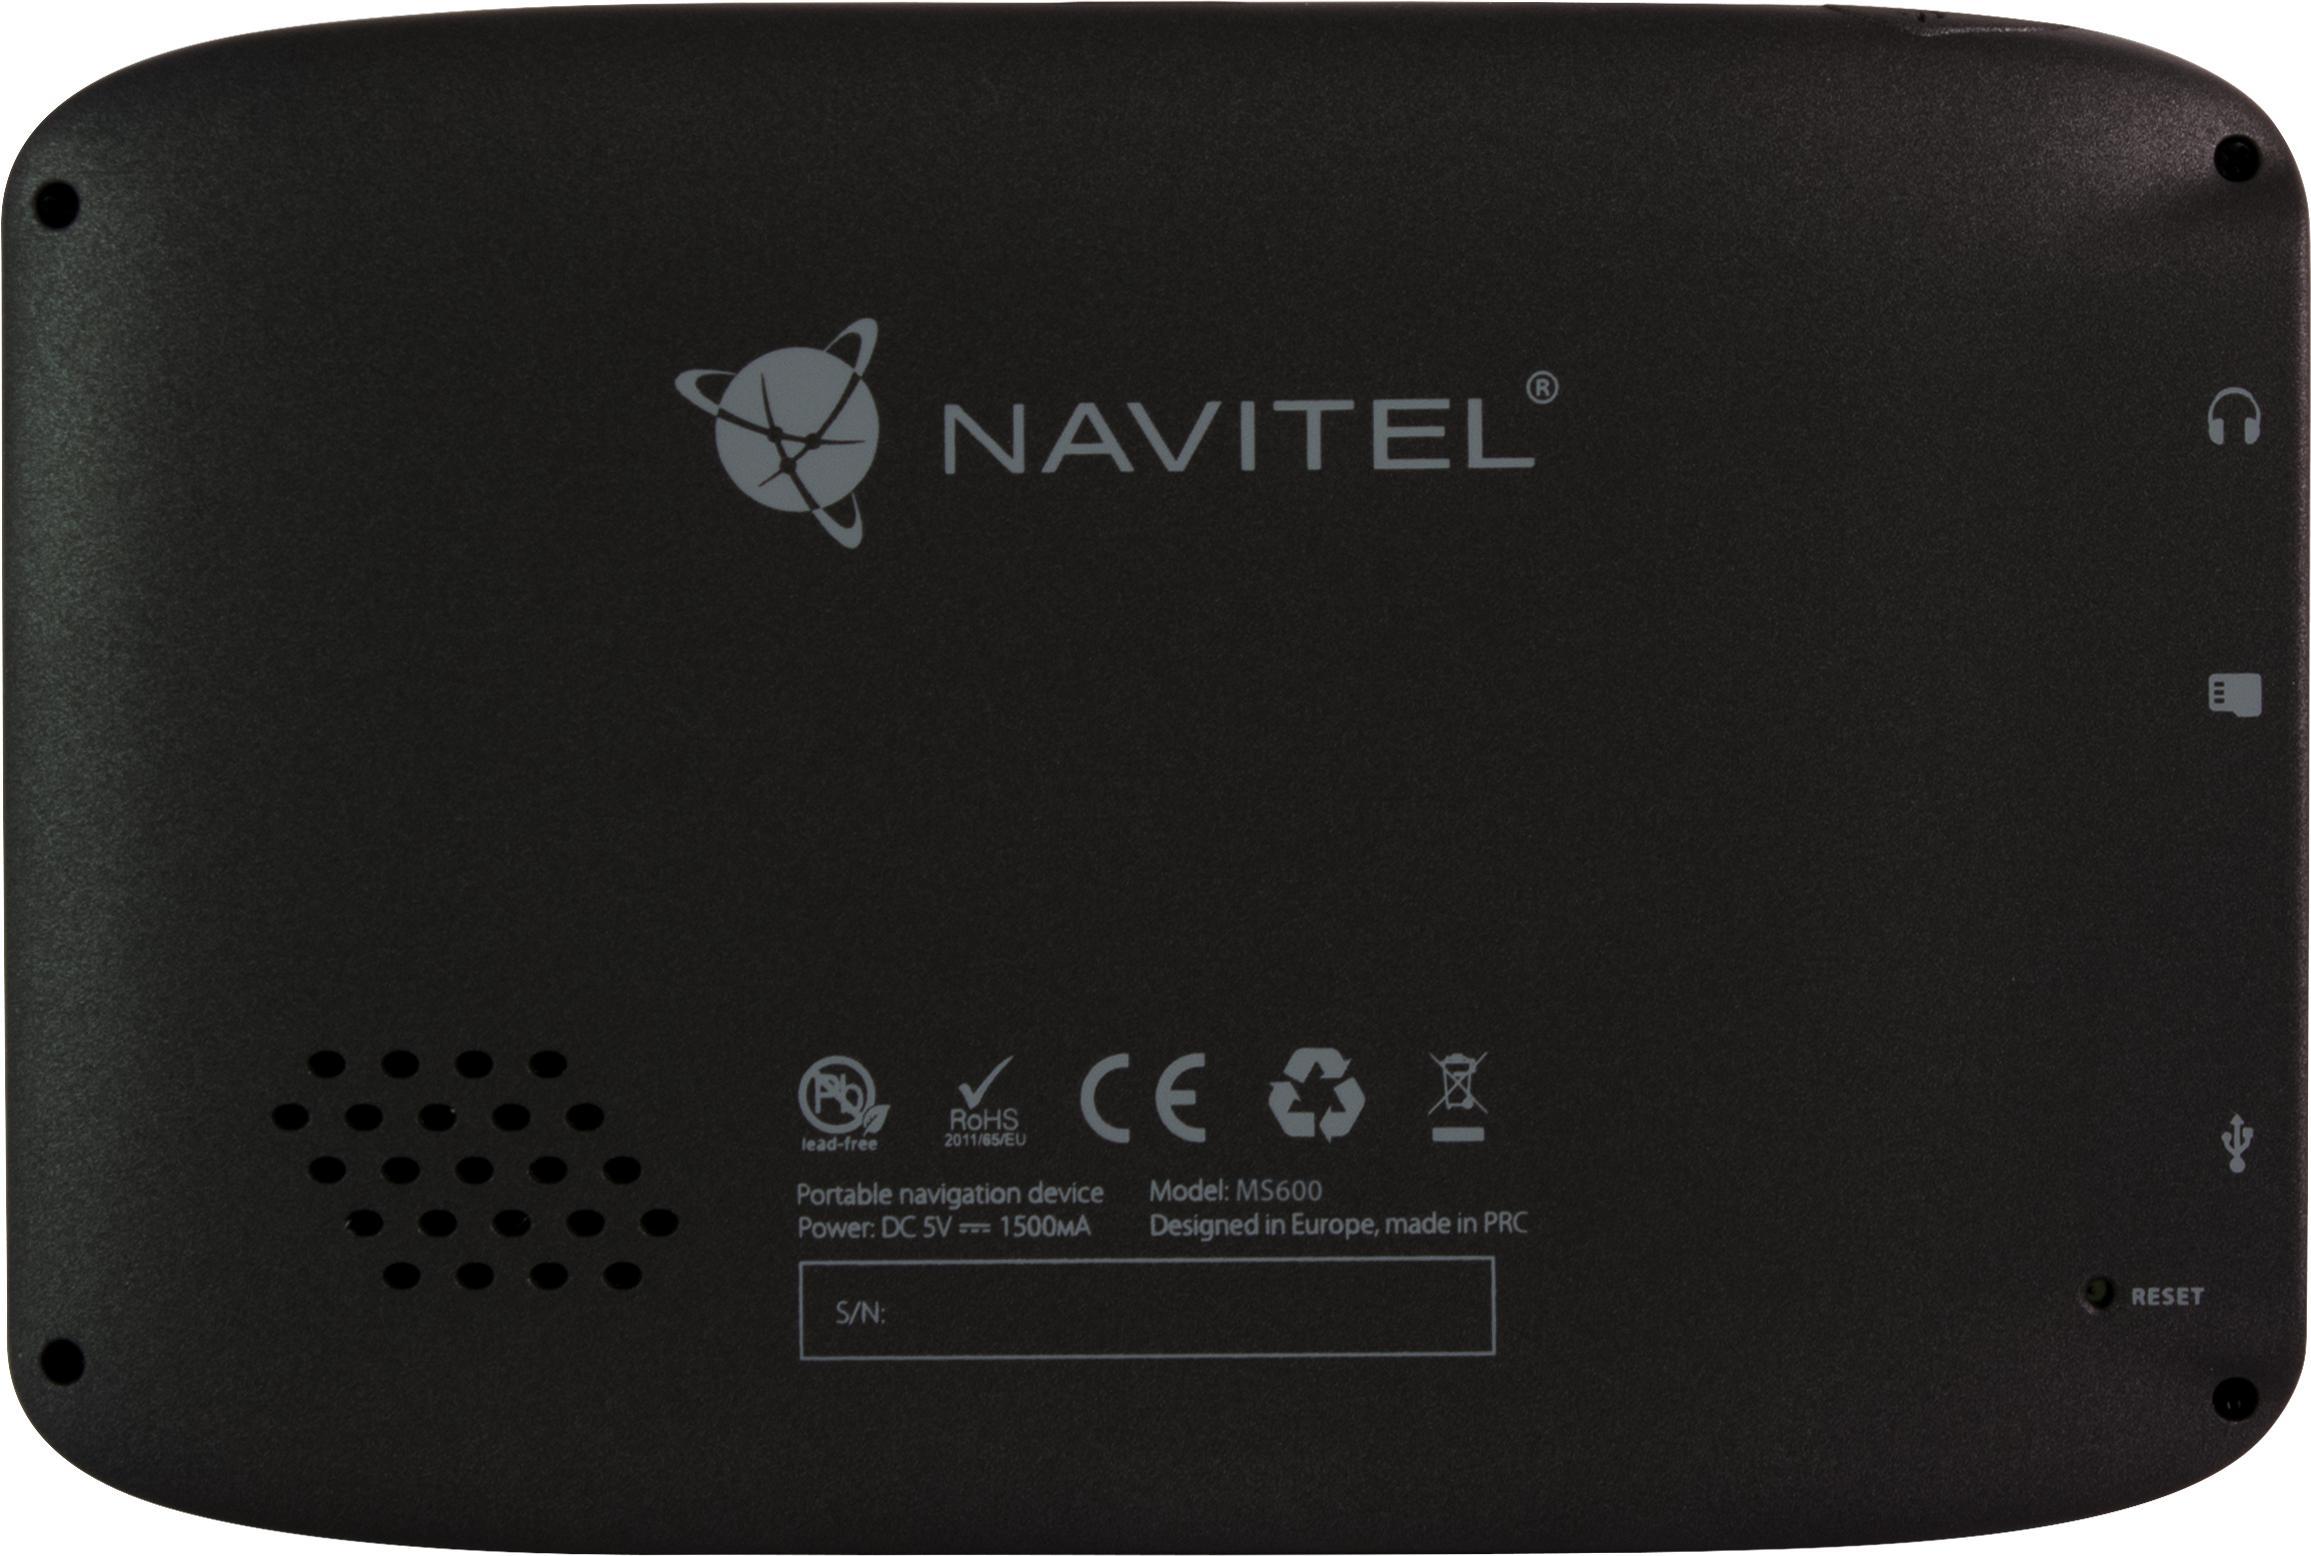 NAVMS400 Navigationssystem NAVITEL Erfahrung